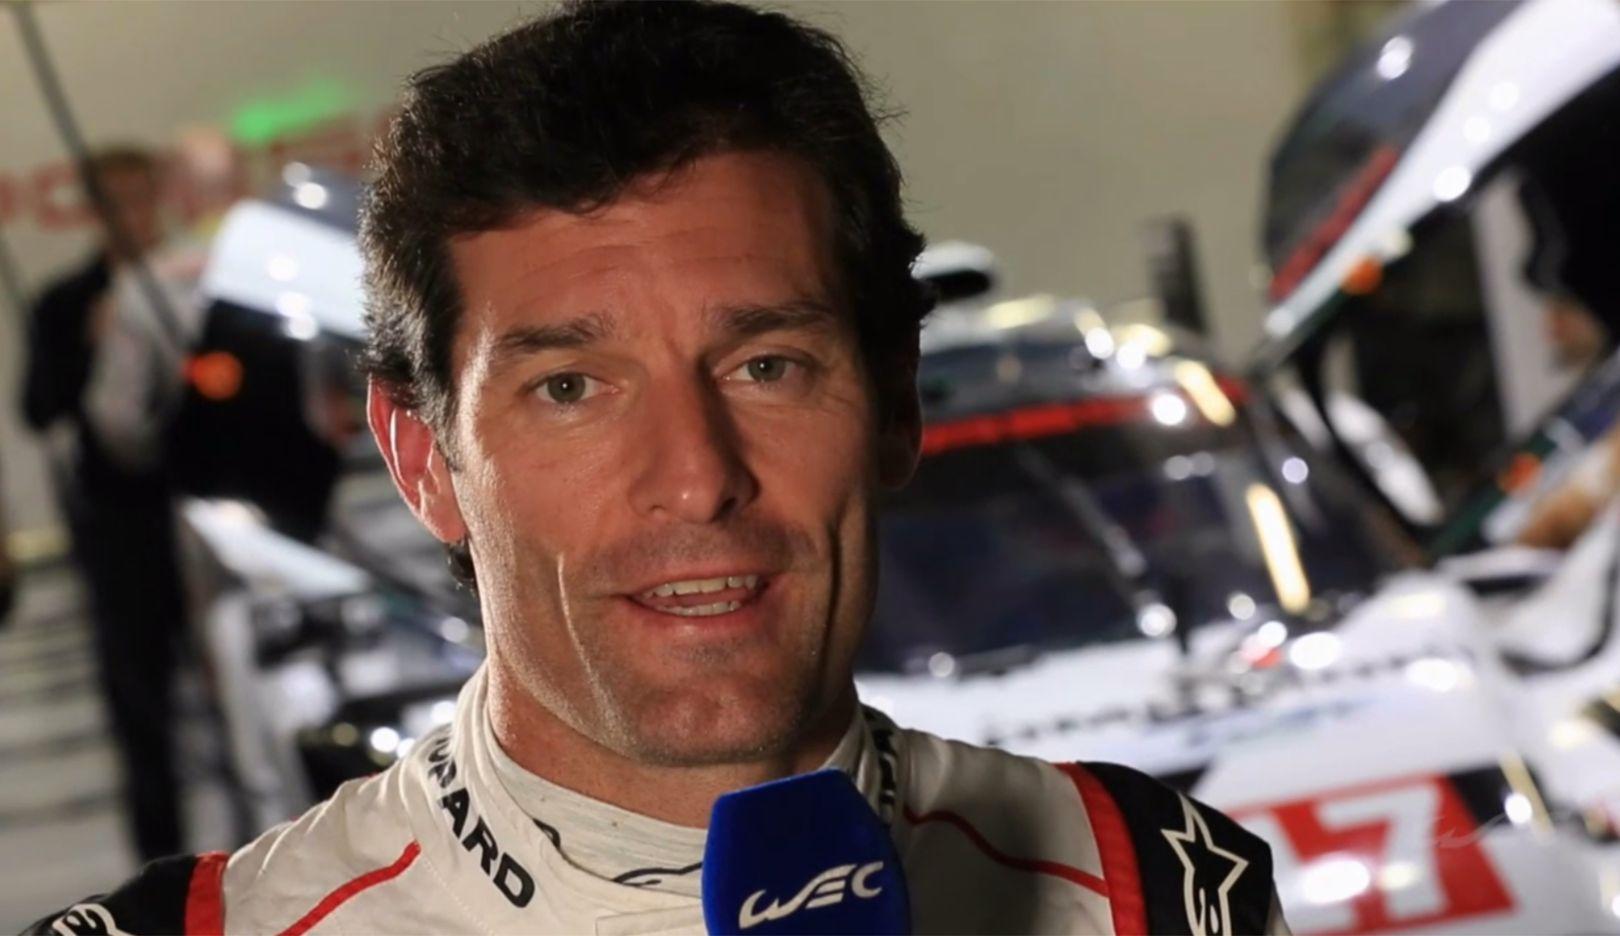 Mark Webber, Werksfahrer, Fuji, 2015, Porsche AG